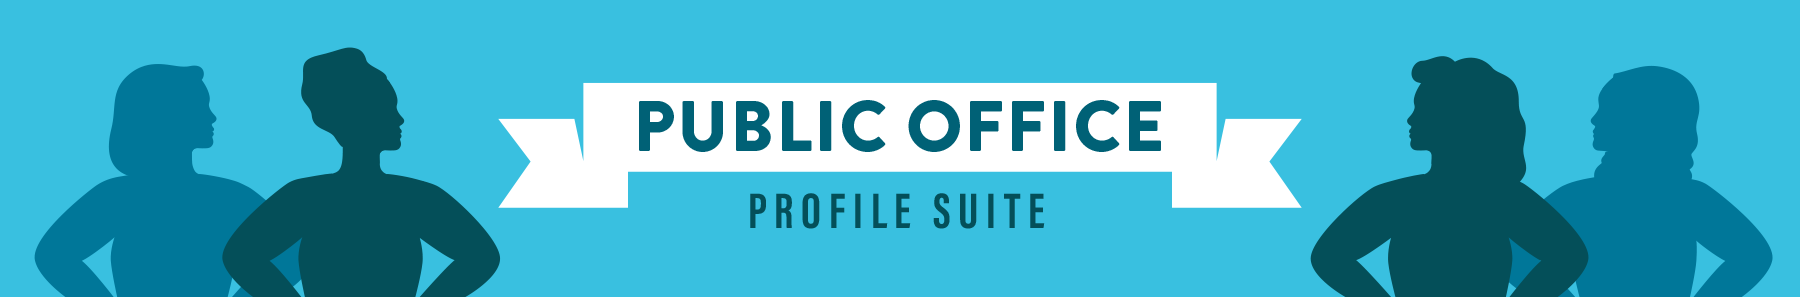 Public Office Profile Suite